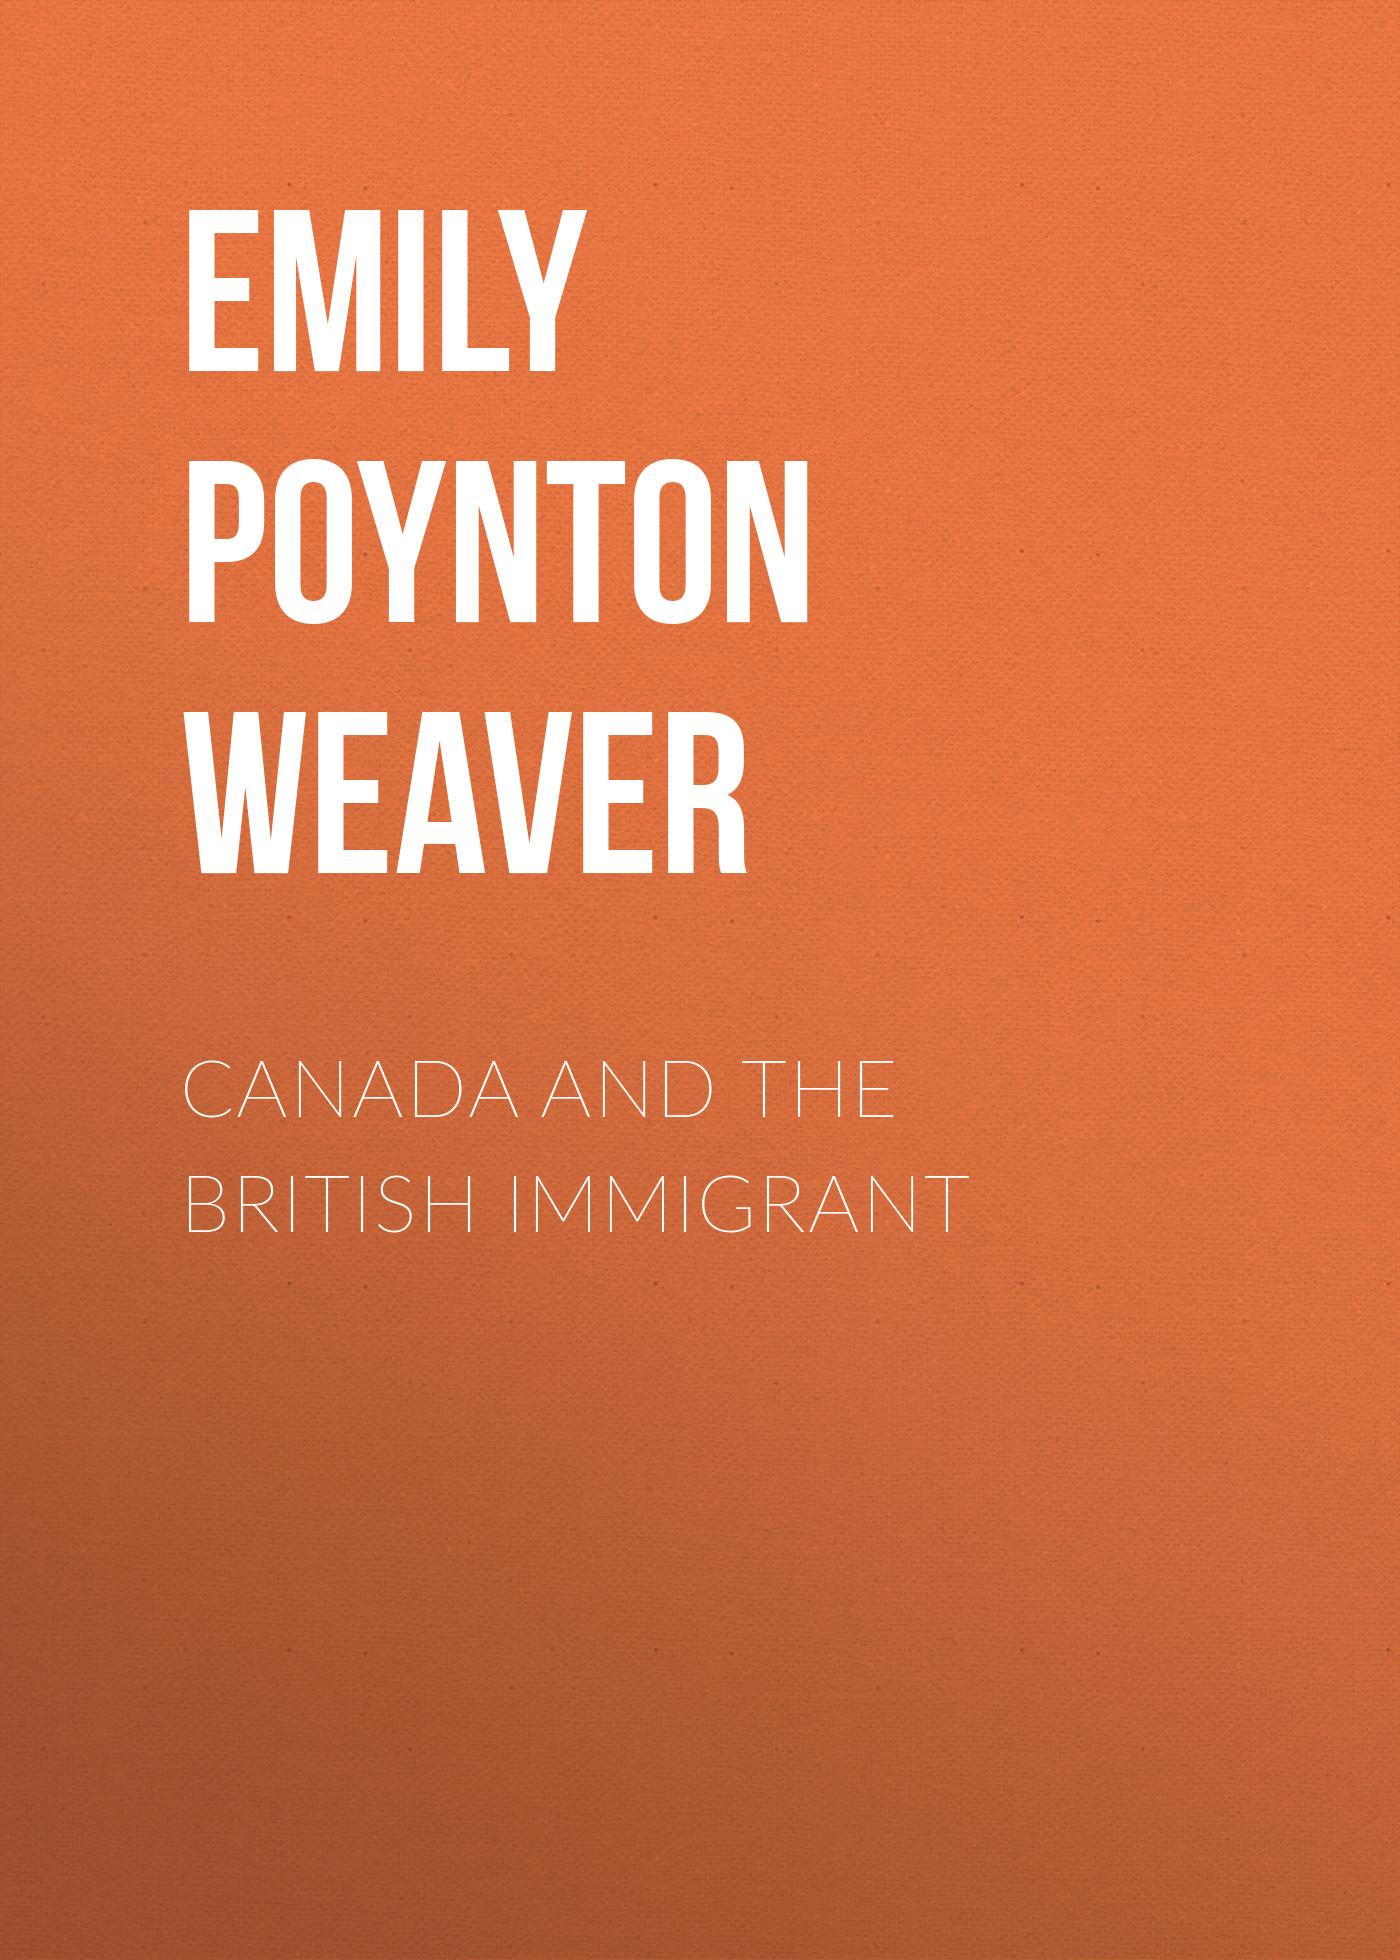 Emily Poynton Weaver Canada and the British immigrant emily poynton weaver old quebec the city of champlain